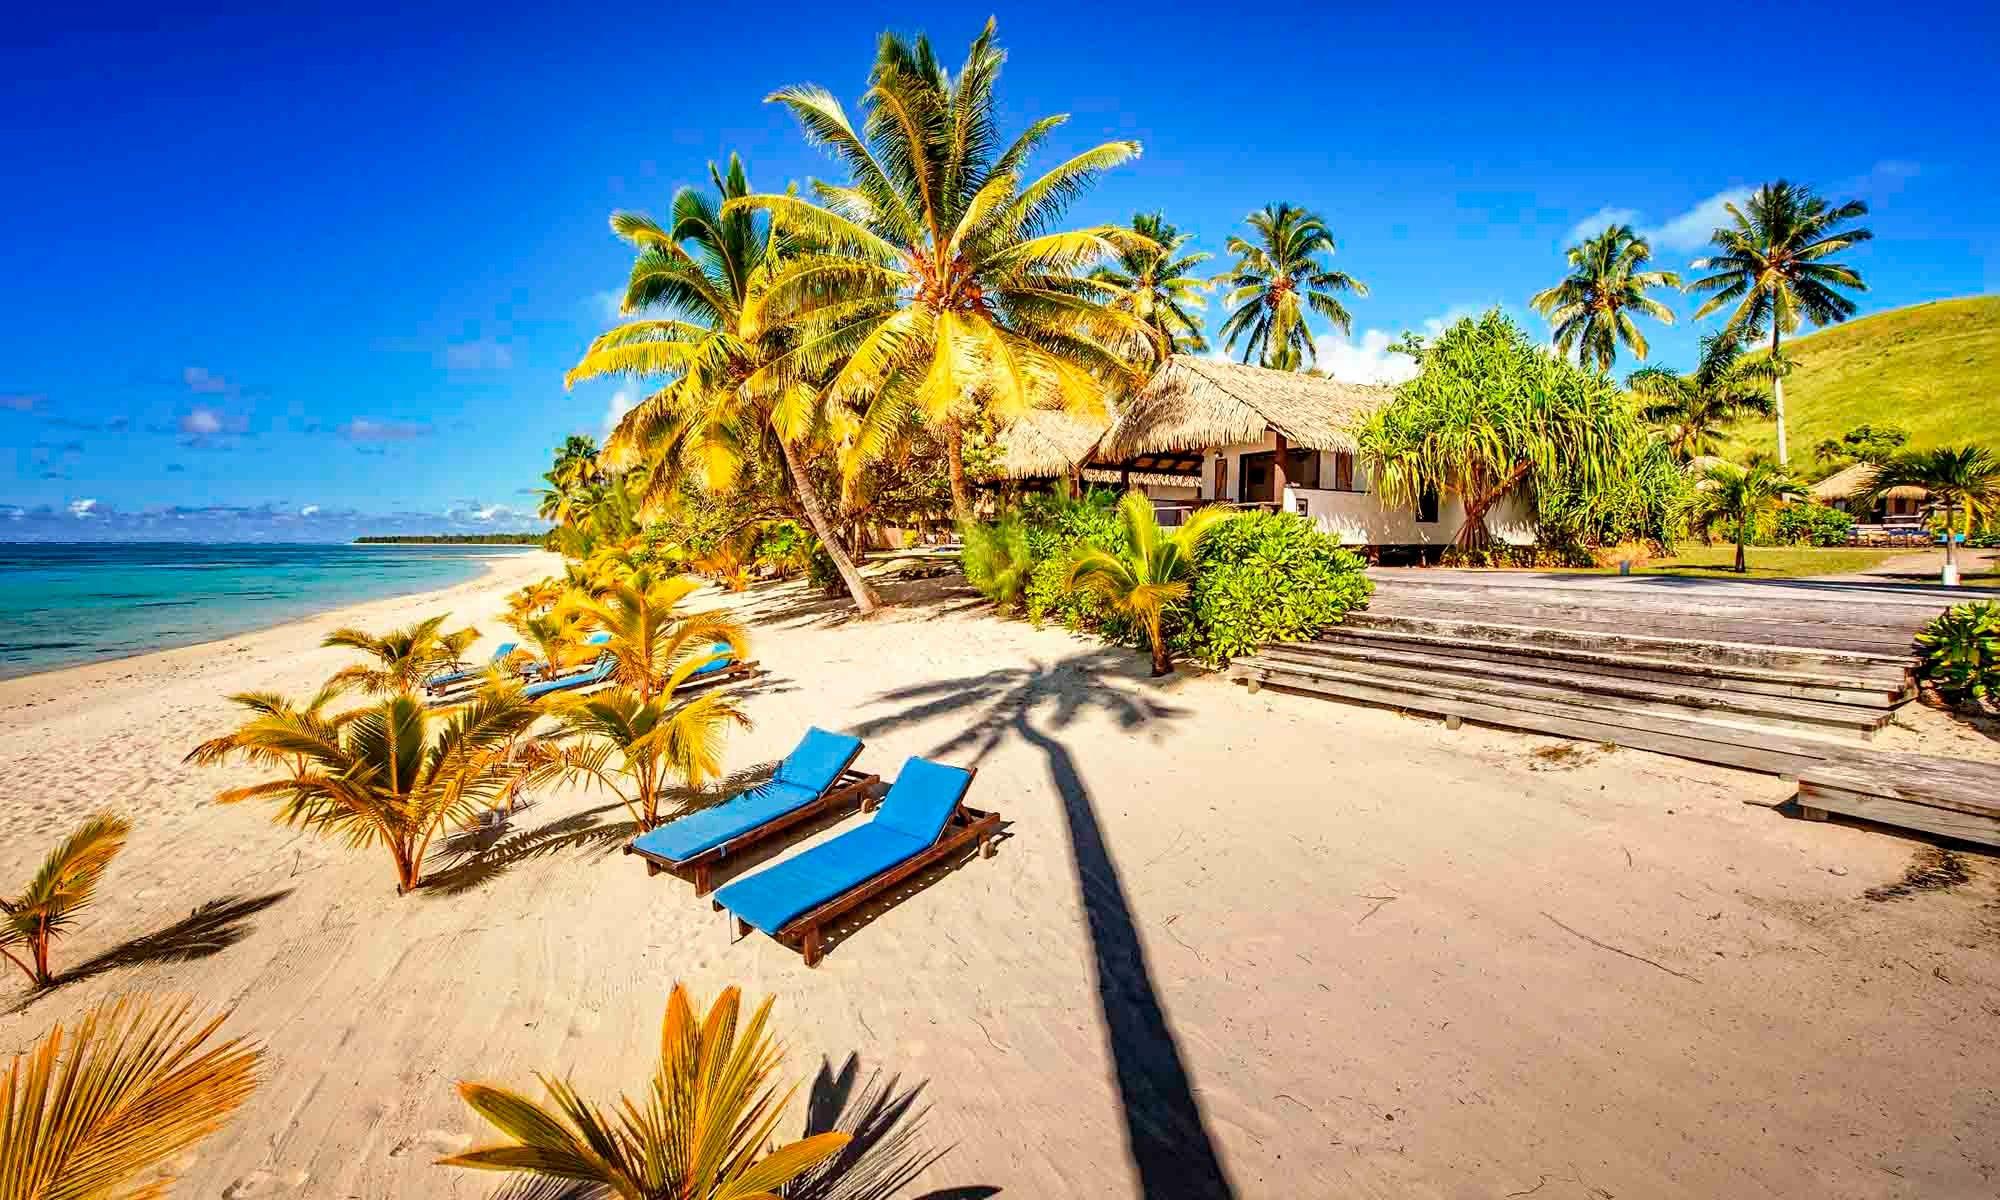 Tamanu beach resort cook islands blue beach chairs